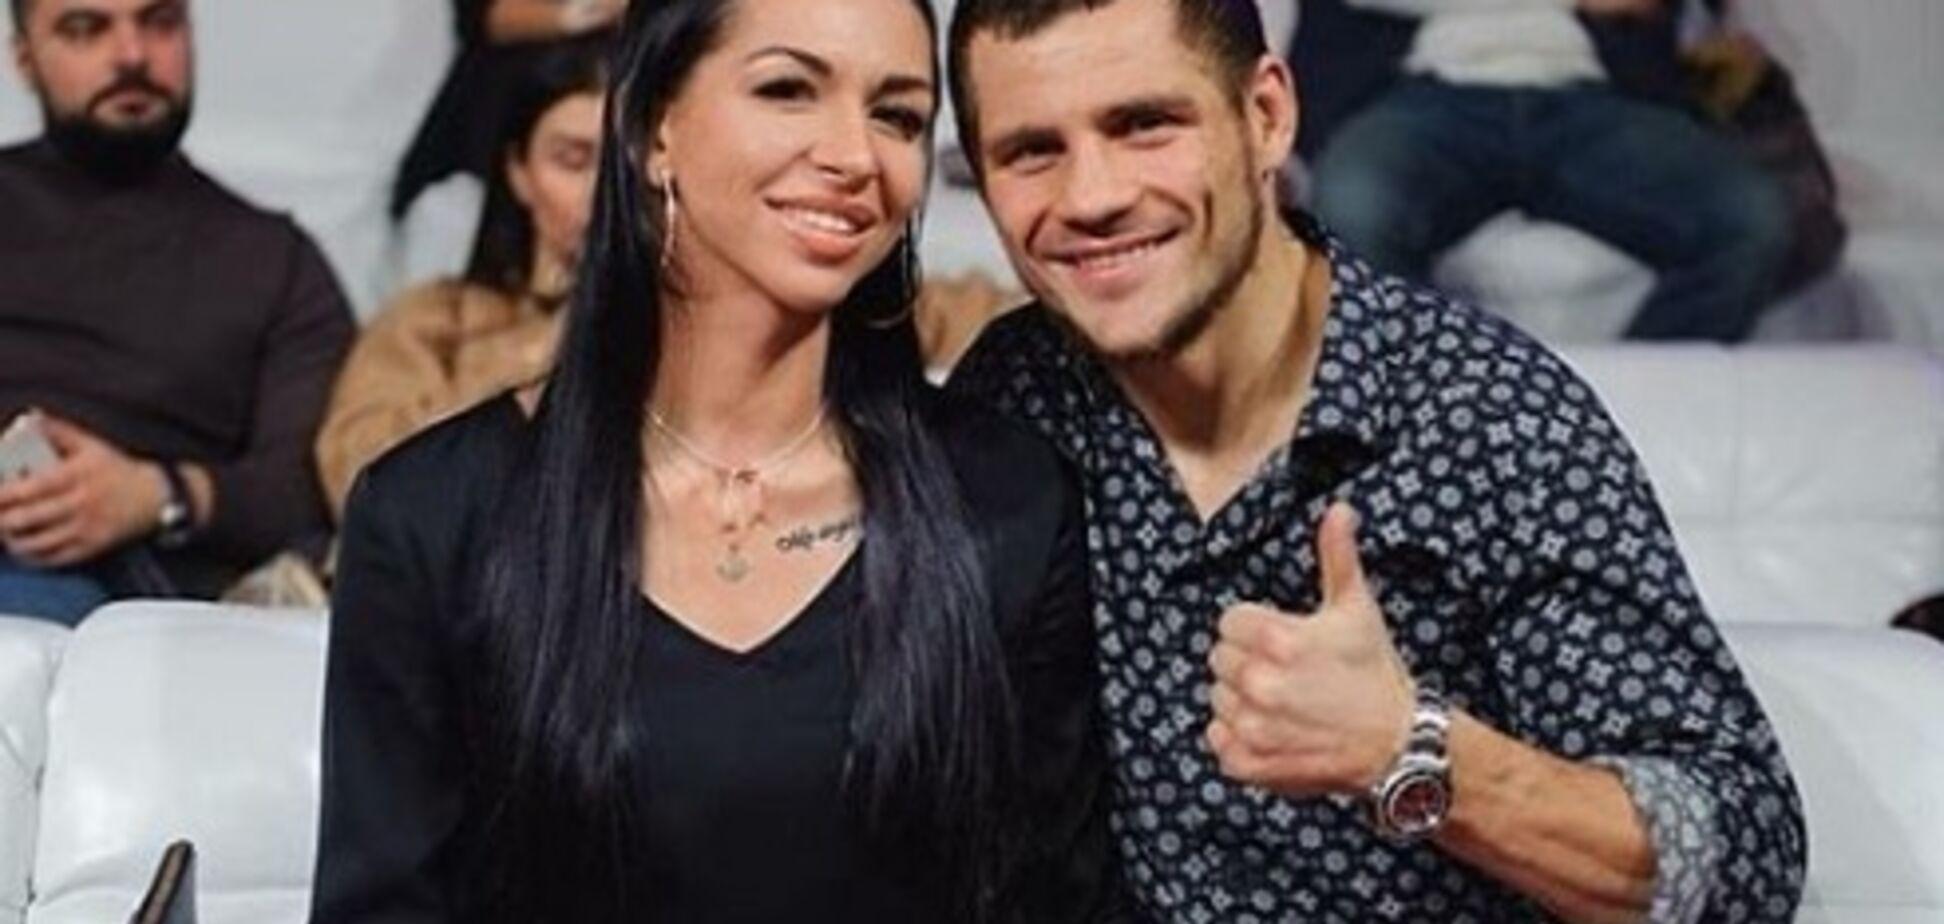 Знаменитий український боксер Денис Берінчик влаштував боротьбу з порно